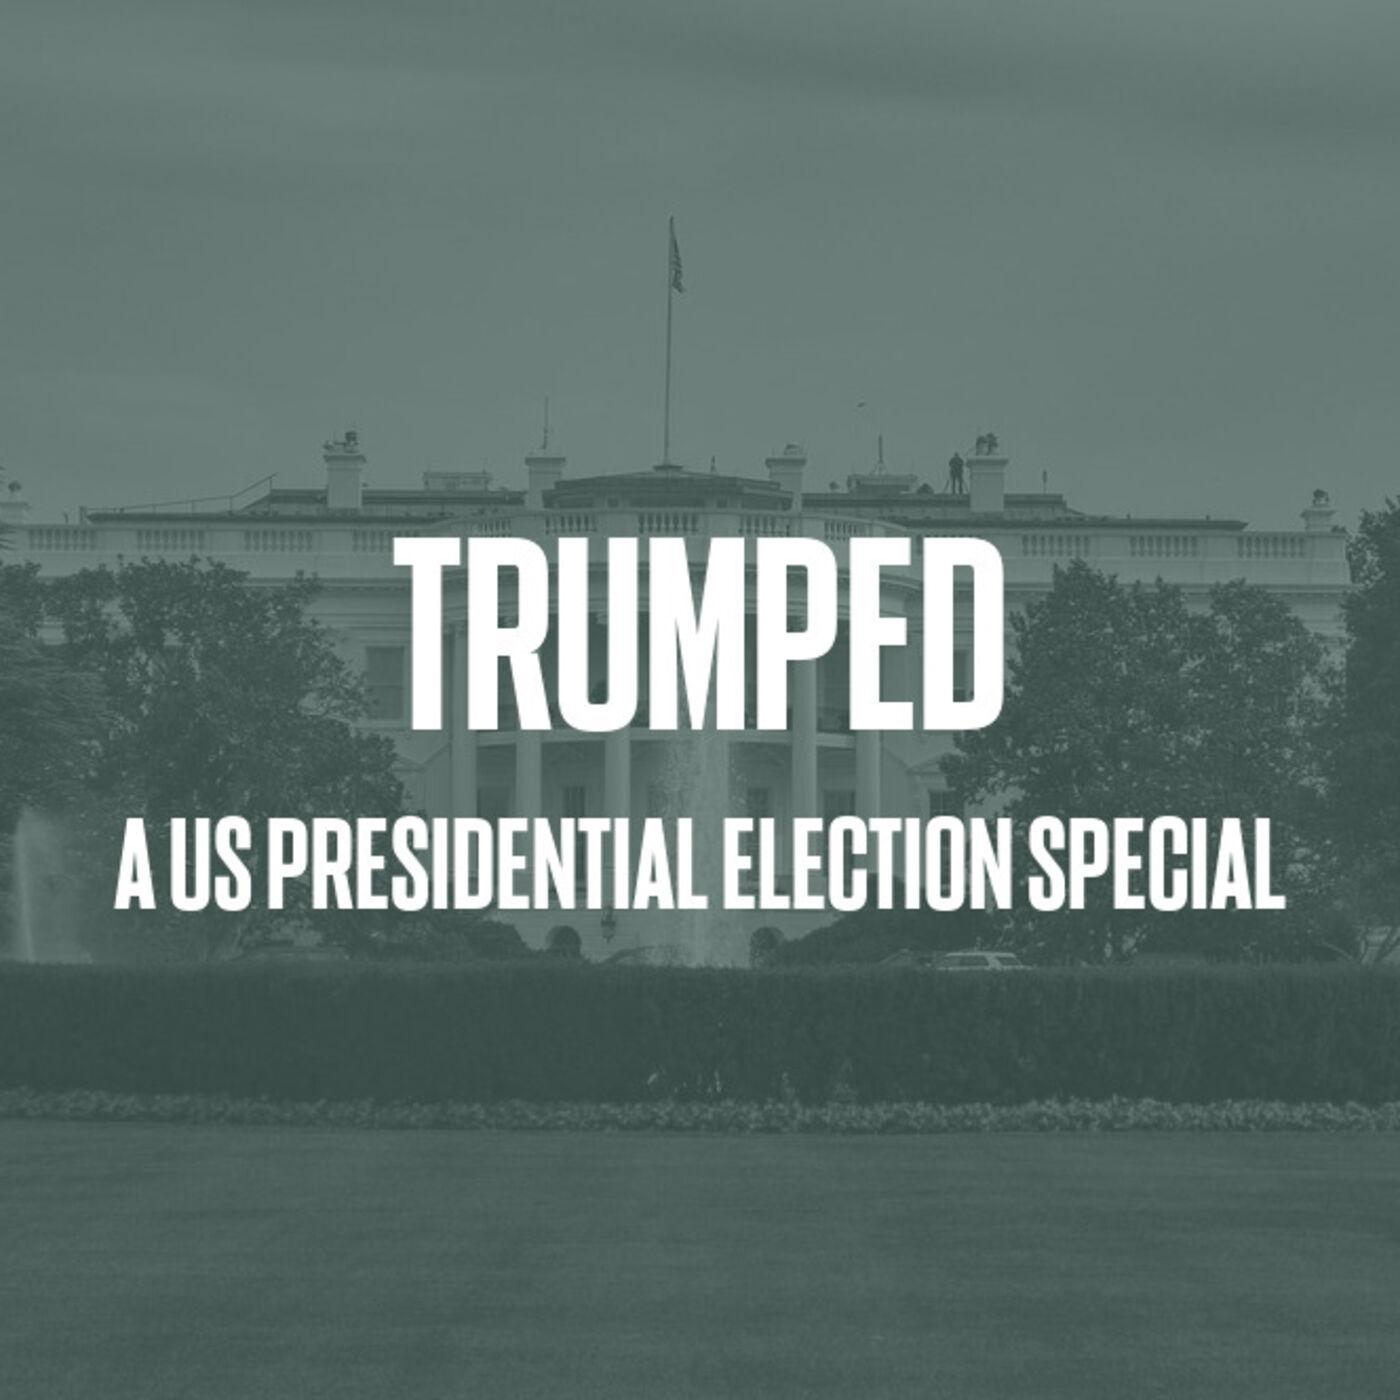 Episode #67 - Trumped